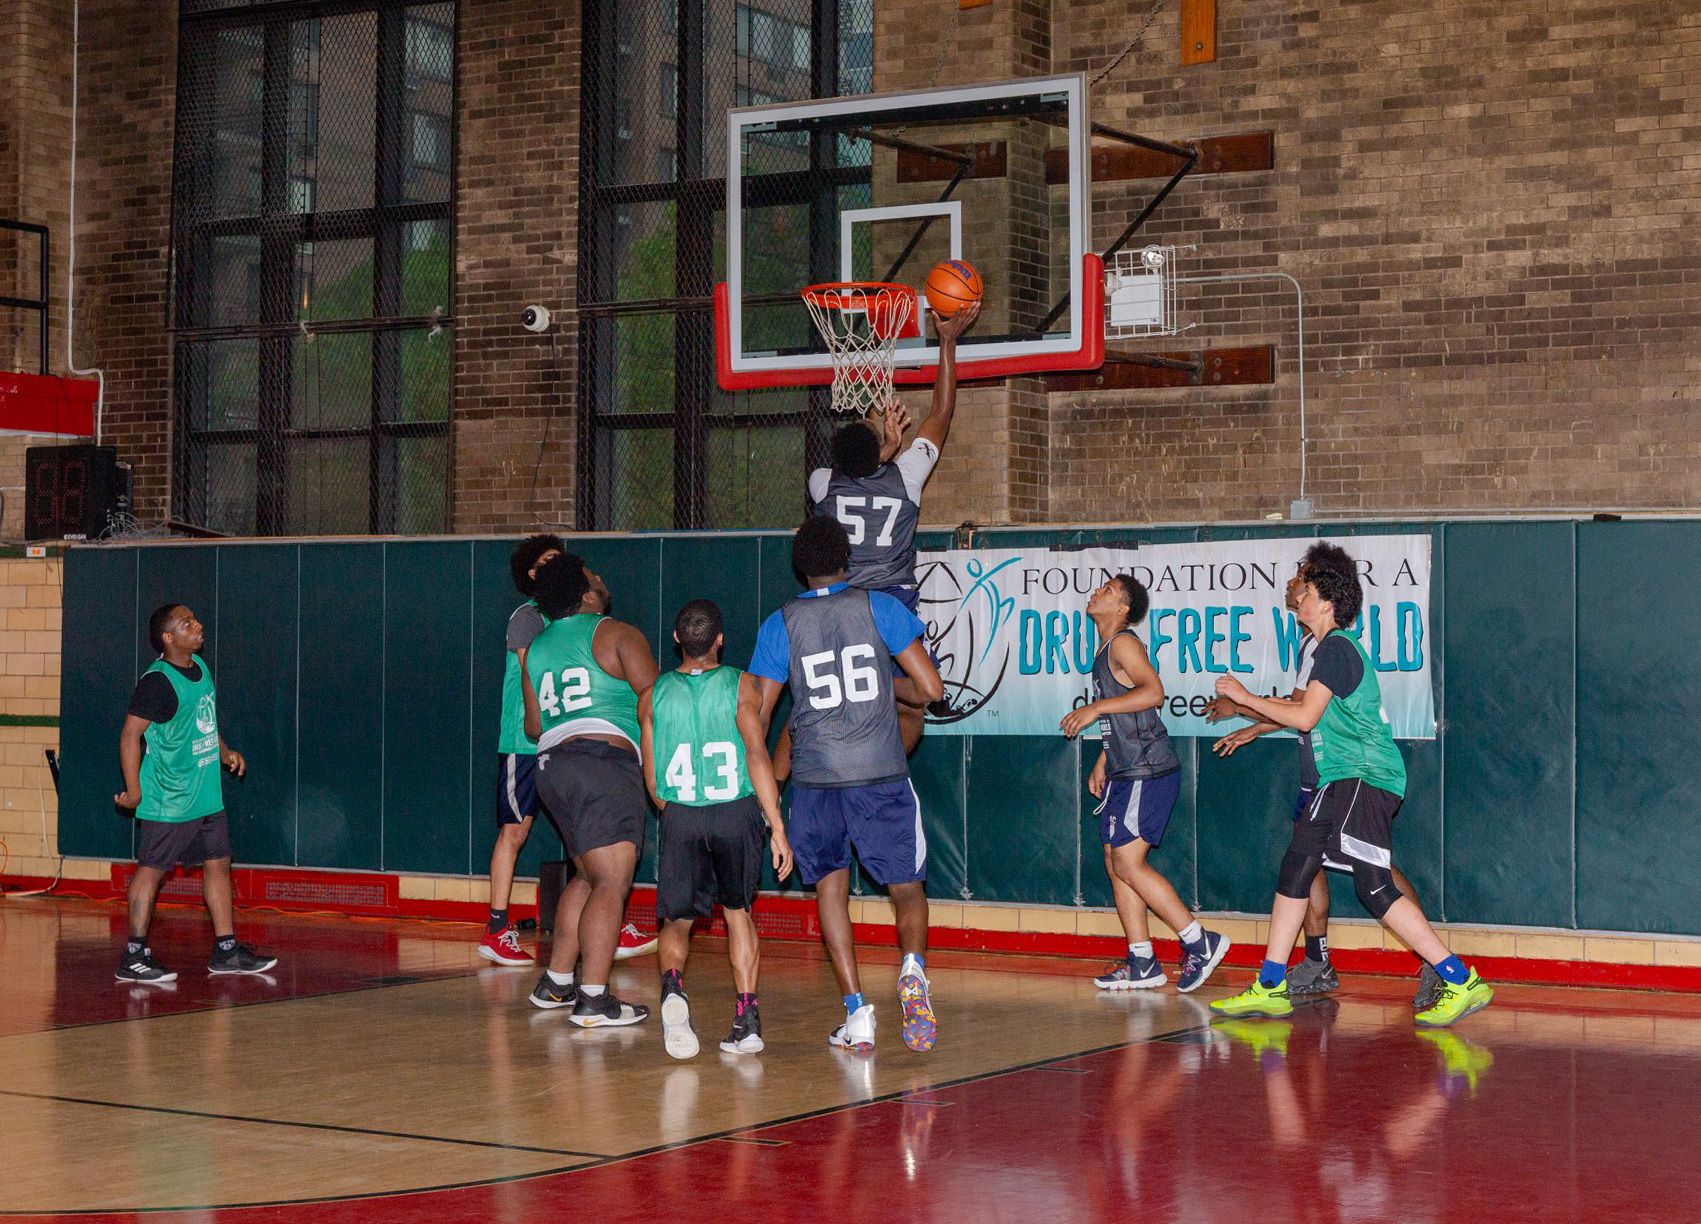 2nd-Annual-Drug-Free-Basketball-Tournament-07.jpg